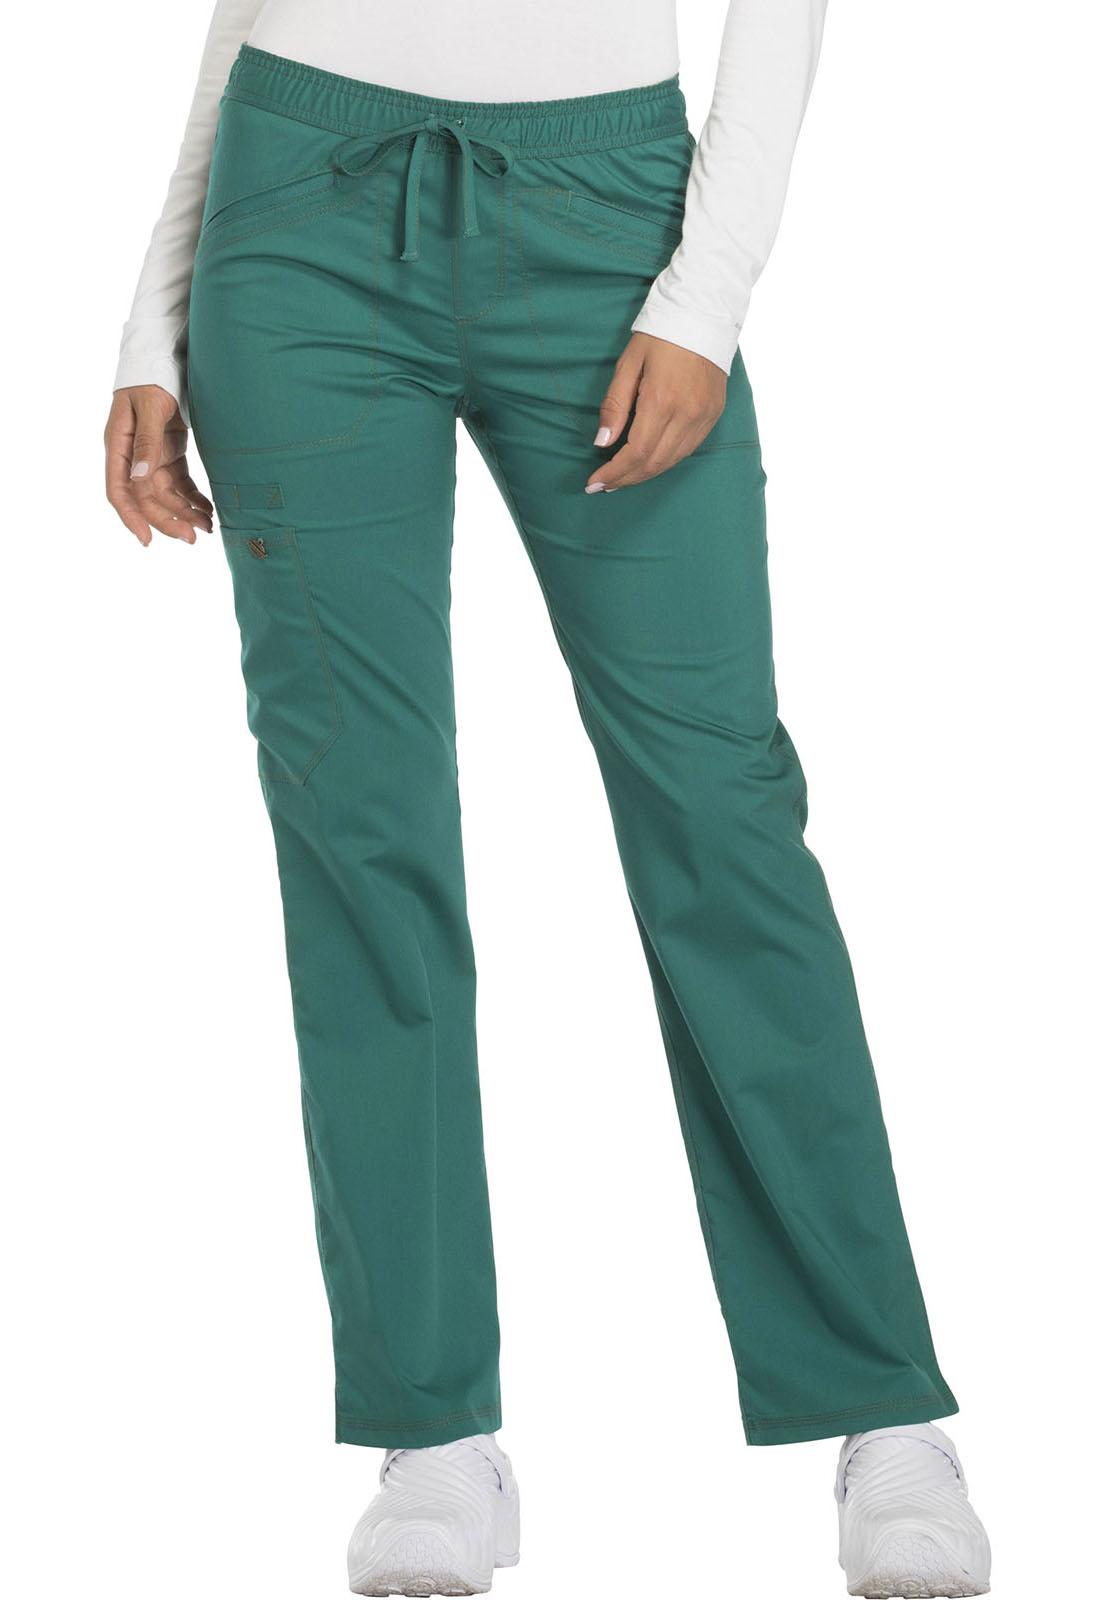 d9d281d7e18 Essence Mid Rise Straight Leg Drawstring Pant in Hunter Green DK106P ...